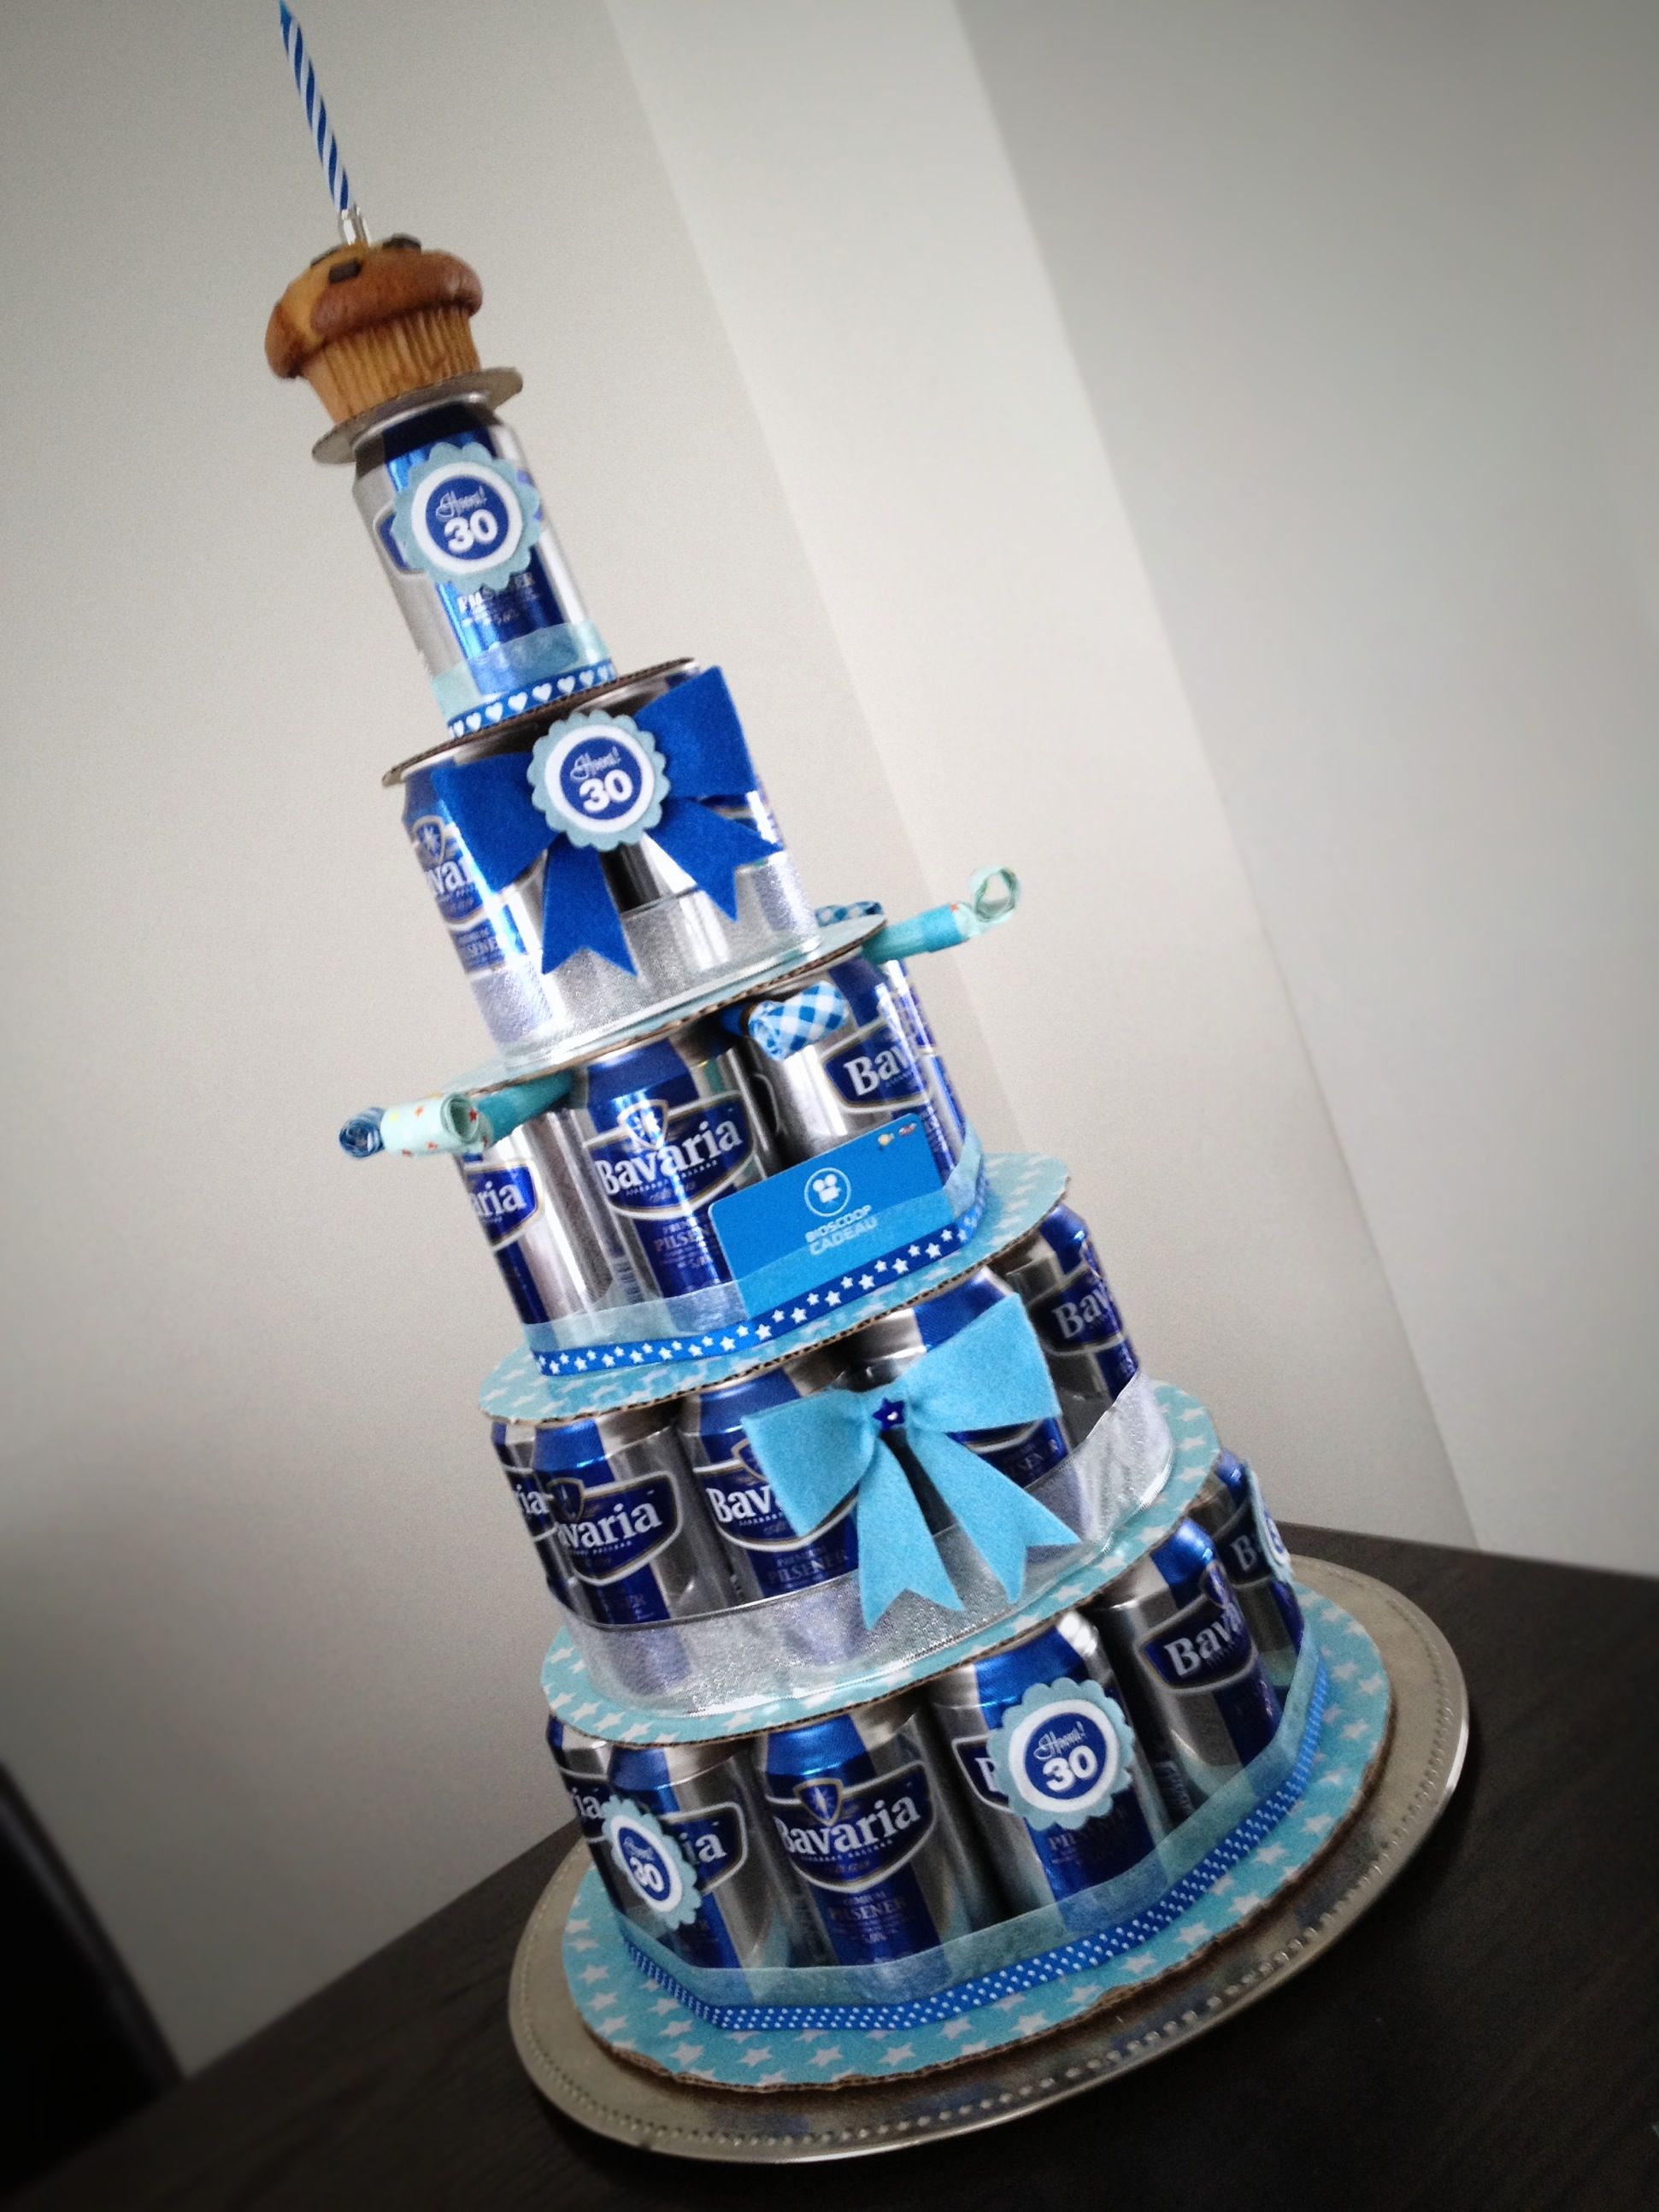 Fabulous 30 jaar?! Maak een biertaart! | MOOI!!! | Pinterest - Gifts &AI93